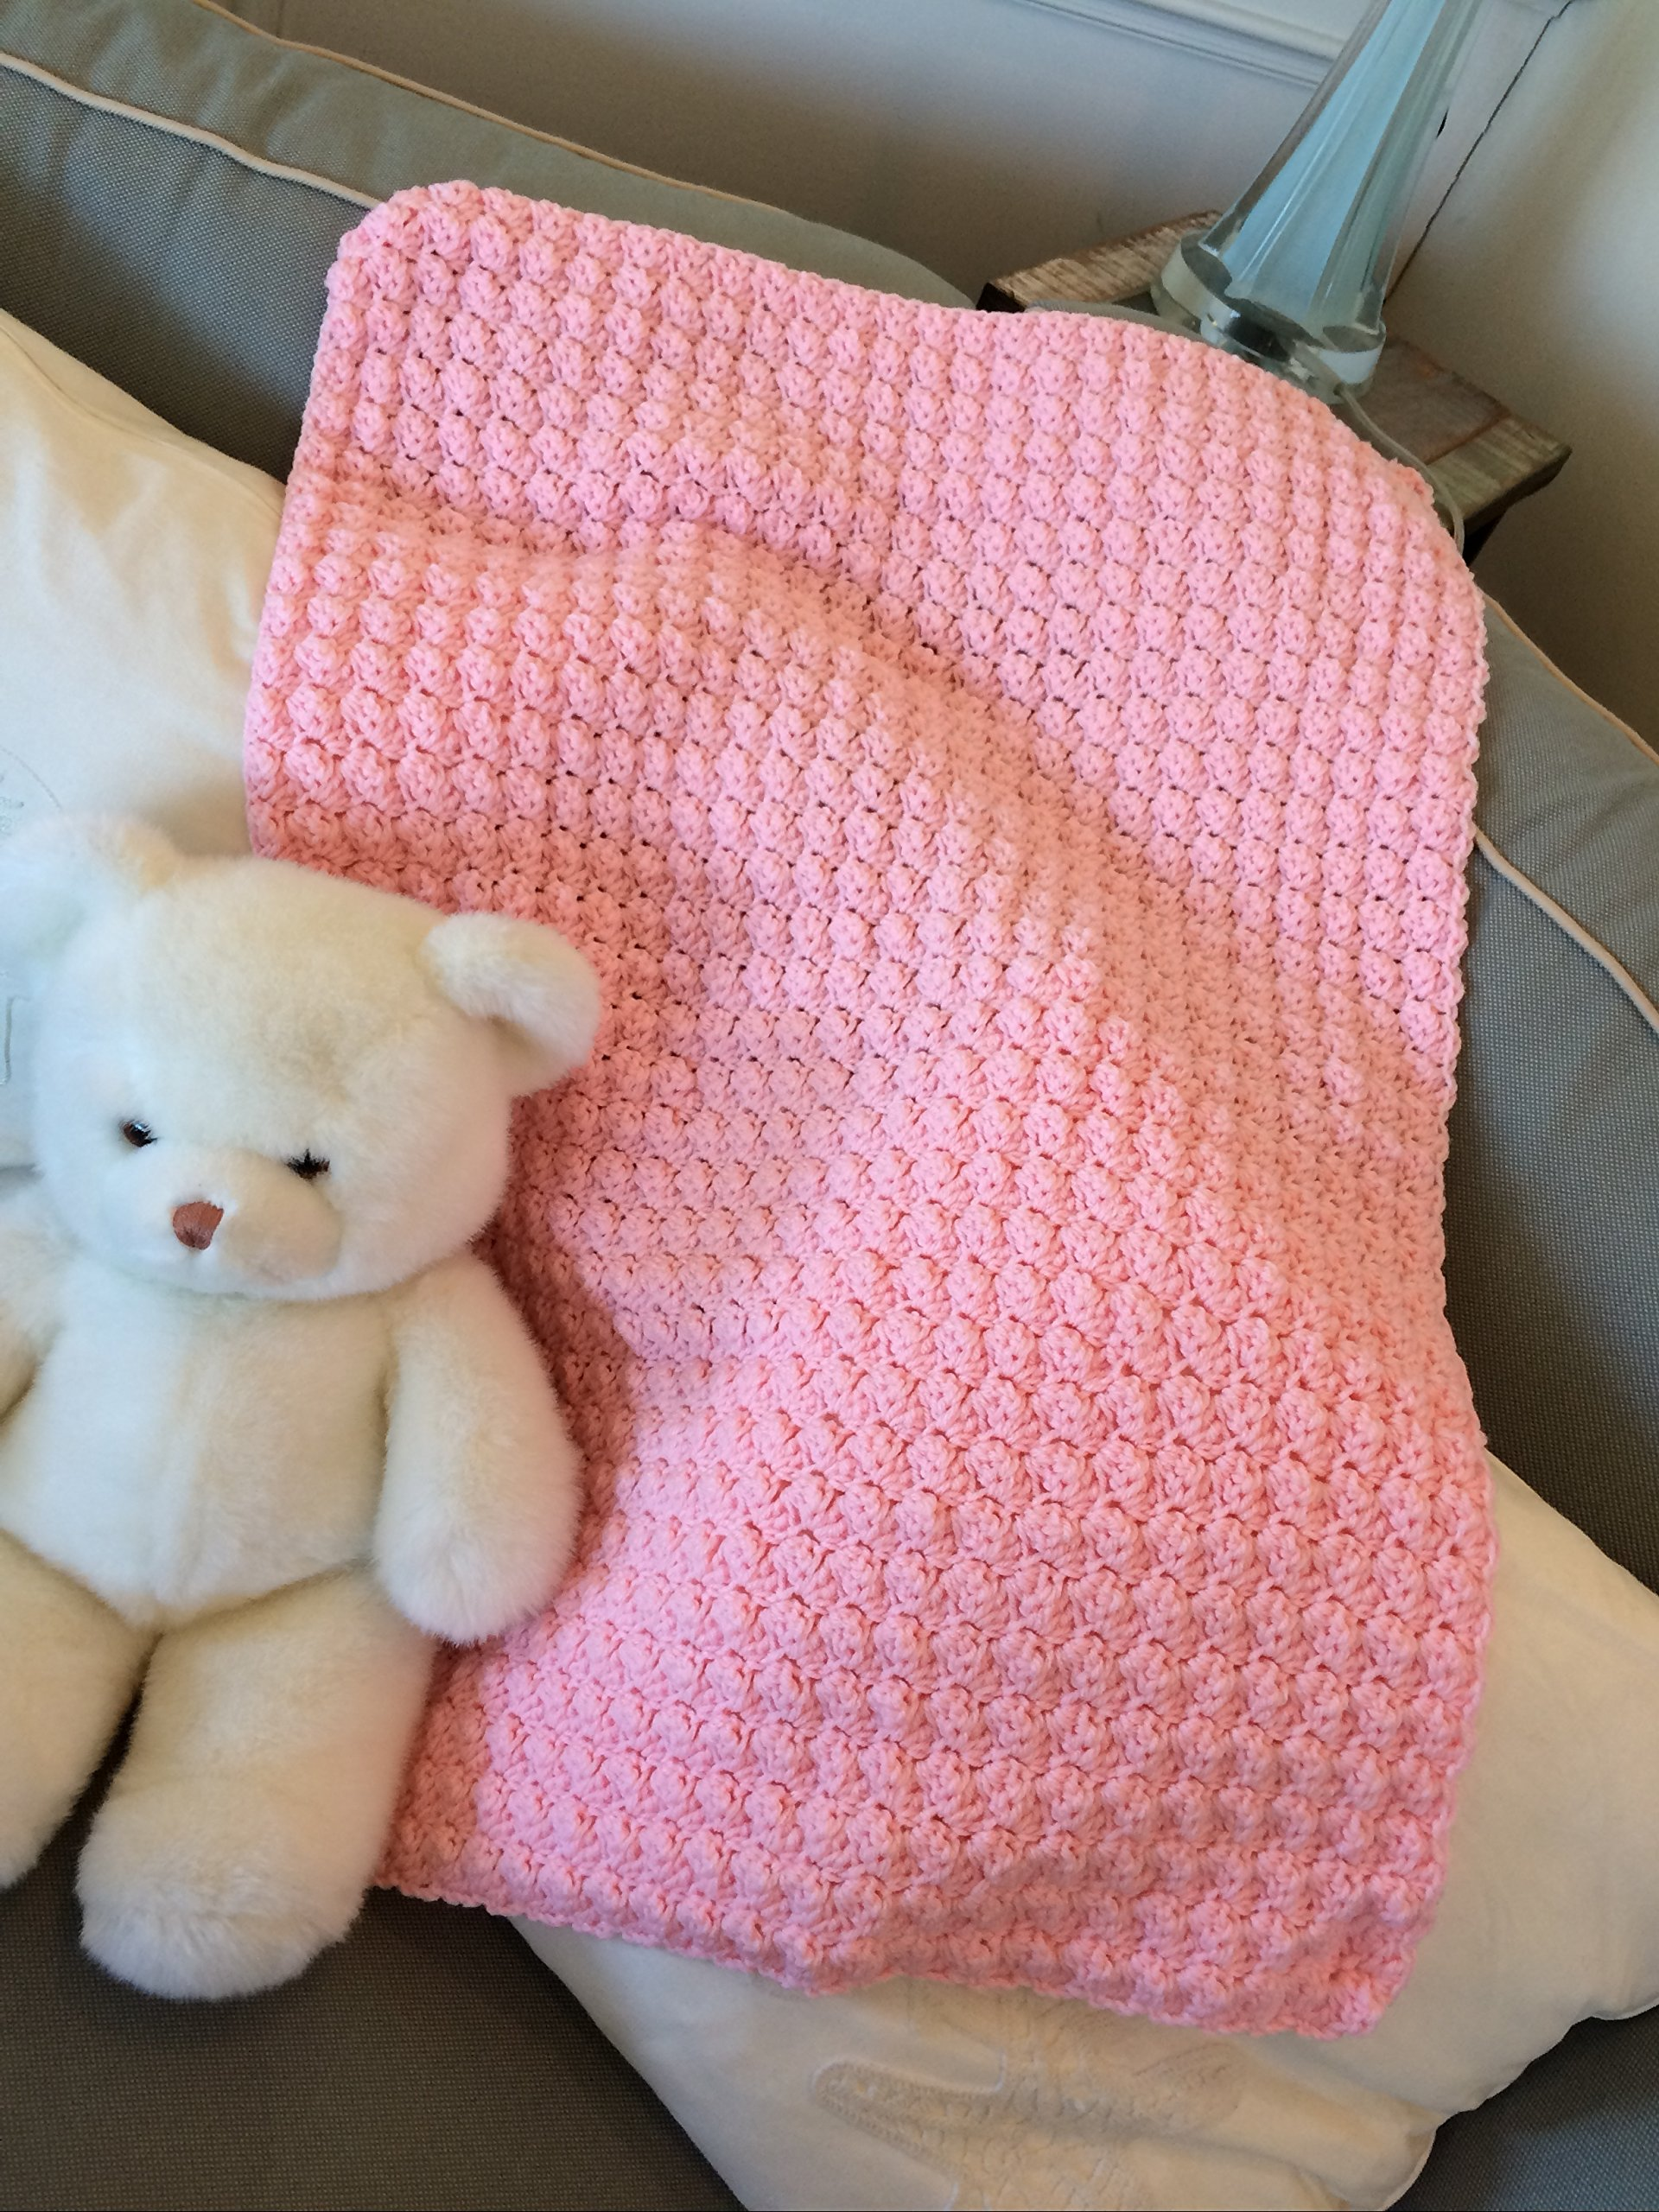 Pink Popcorn handmade crochet afghan